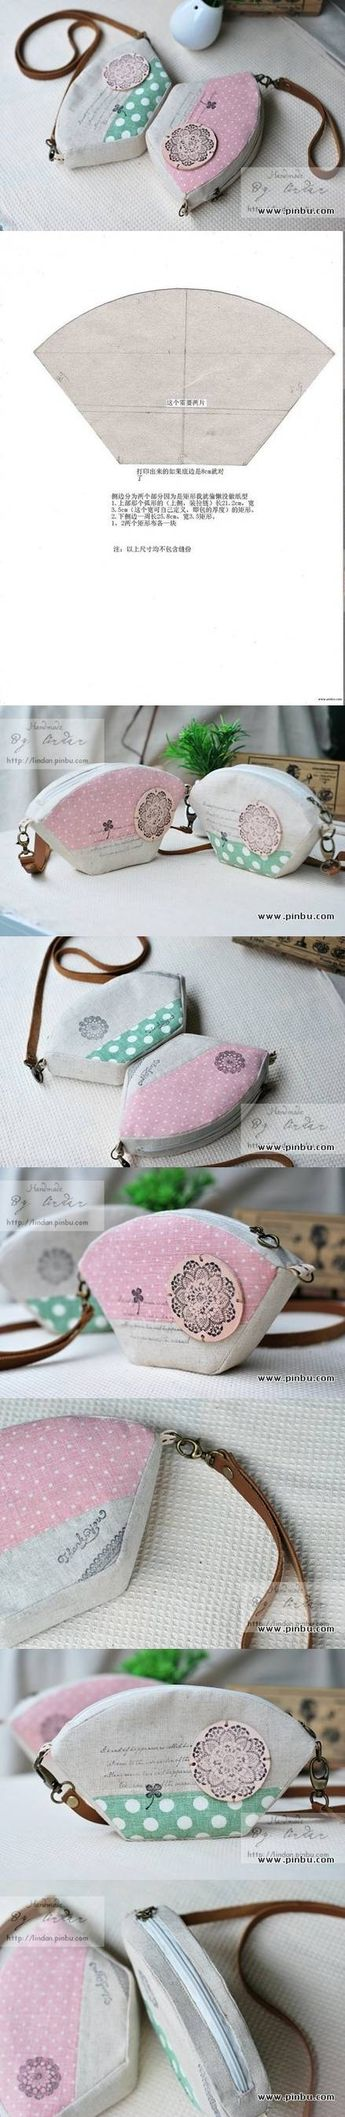 Mini sac à main fraîche bricolage